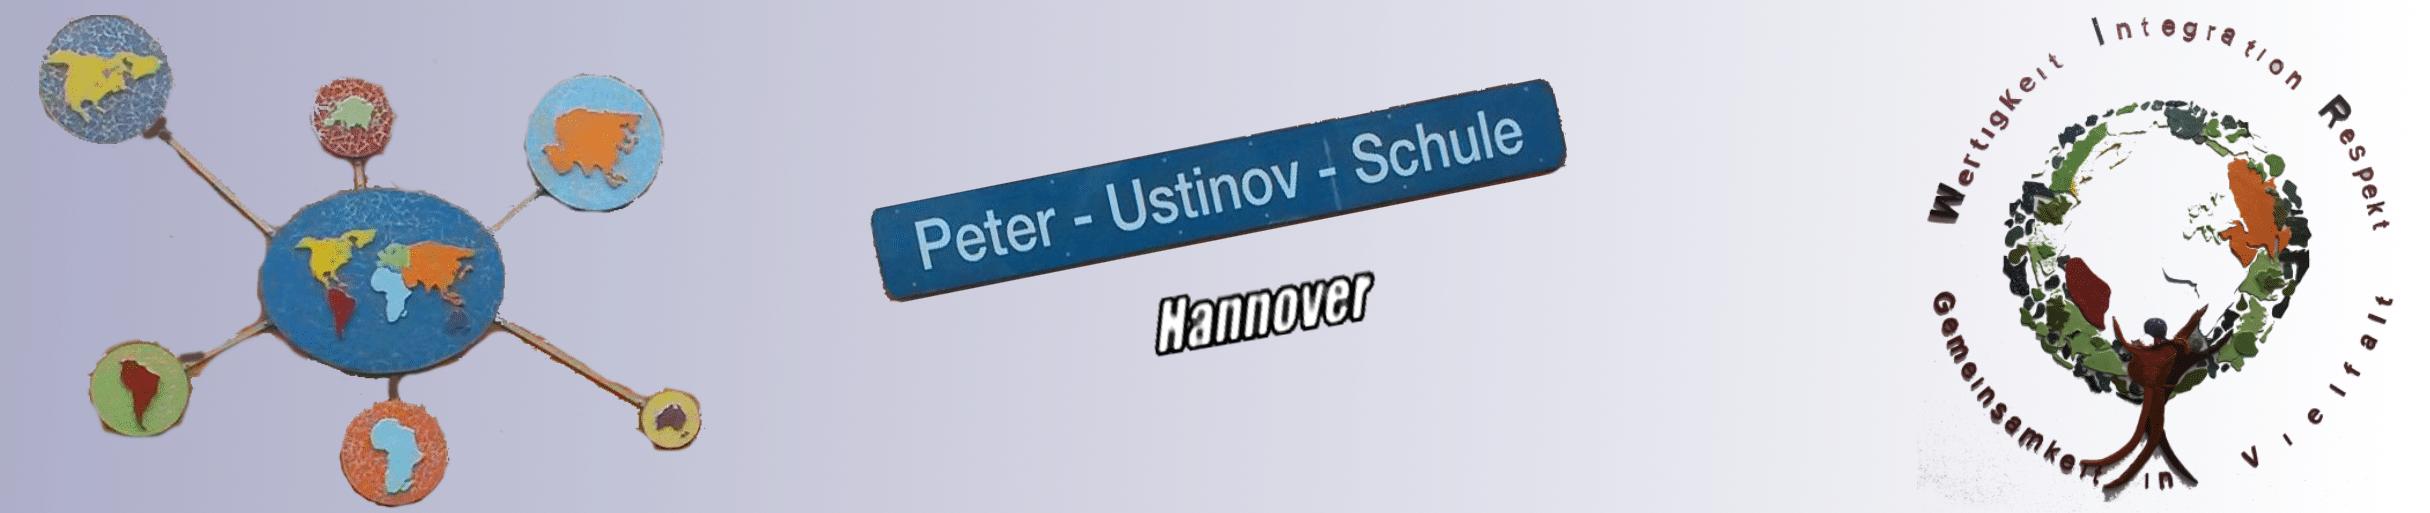 Peter-Ustinov-Schule